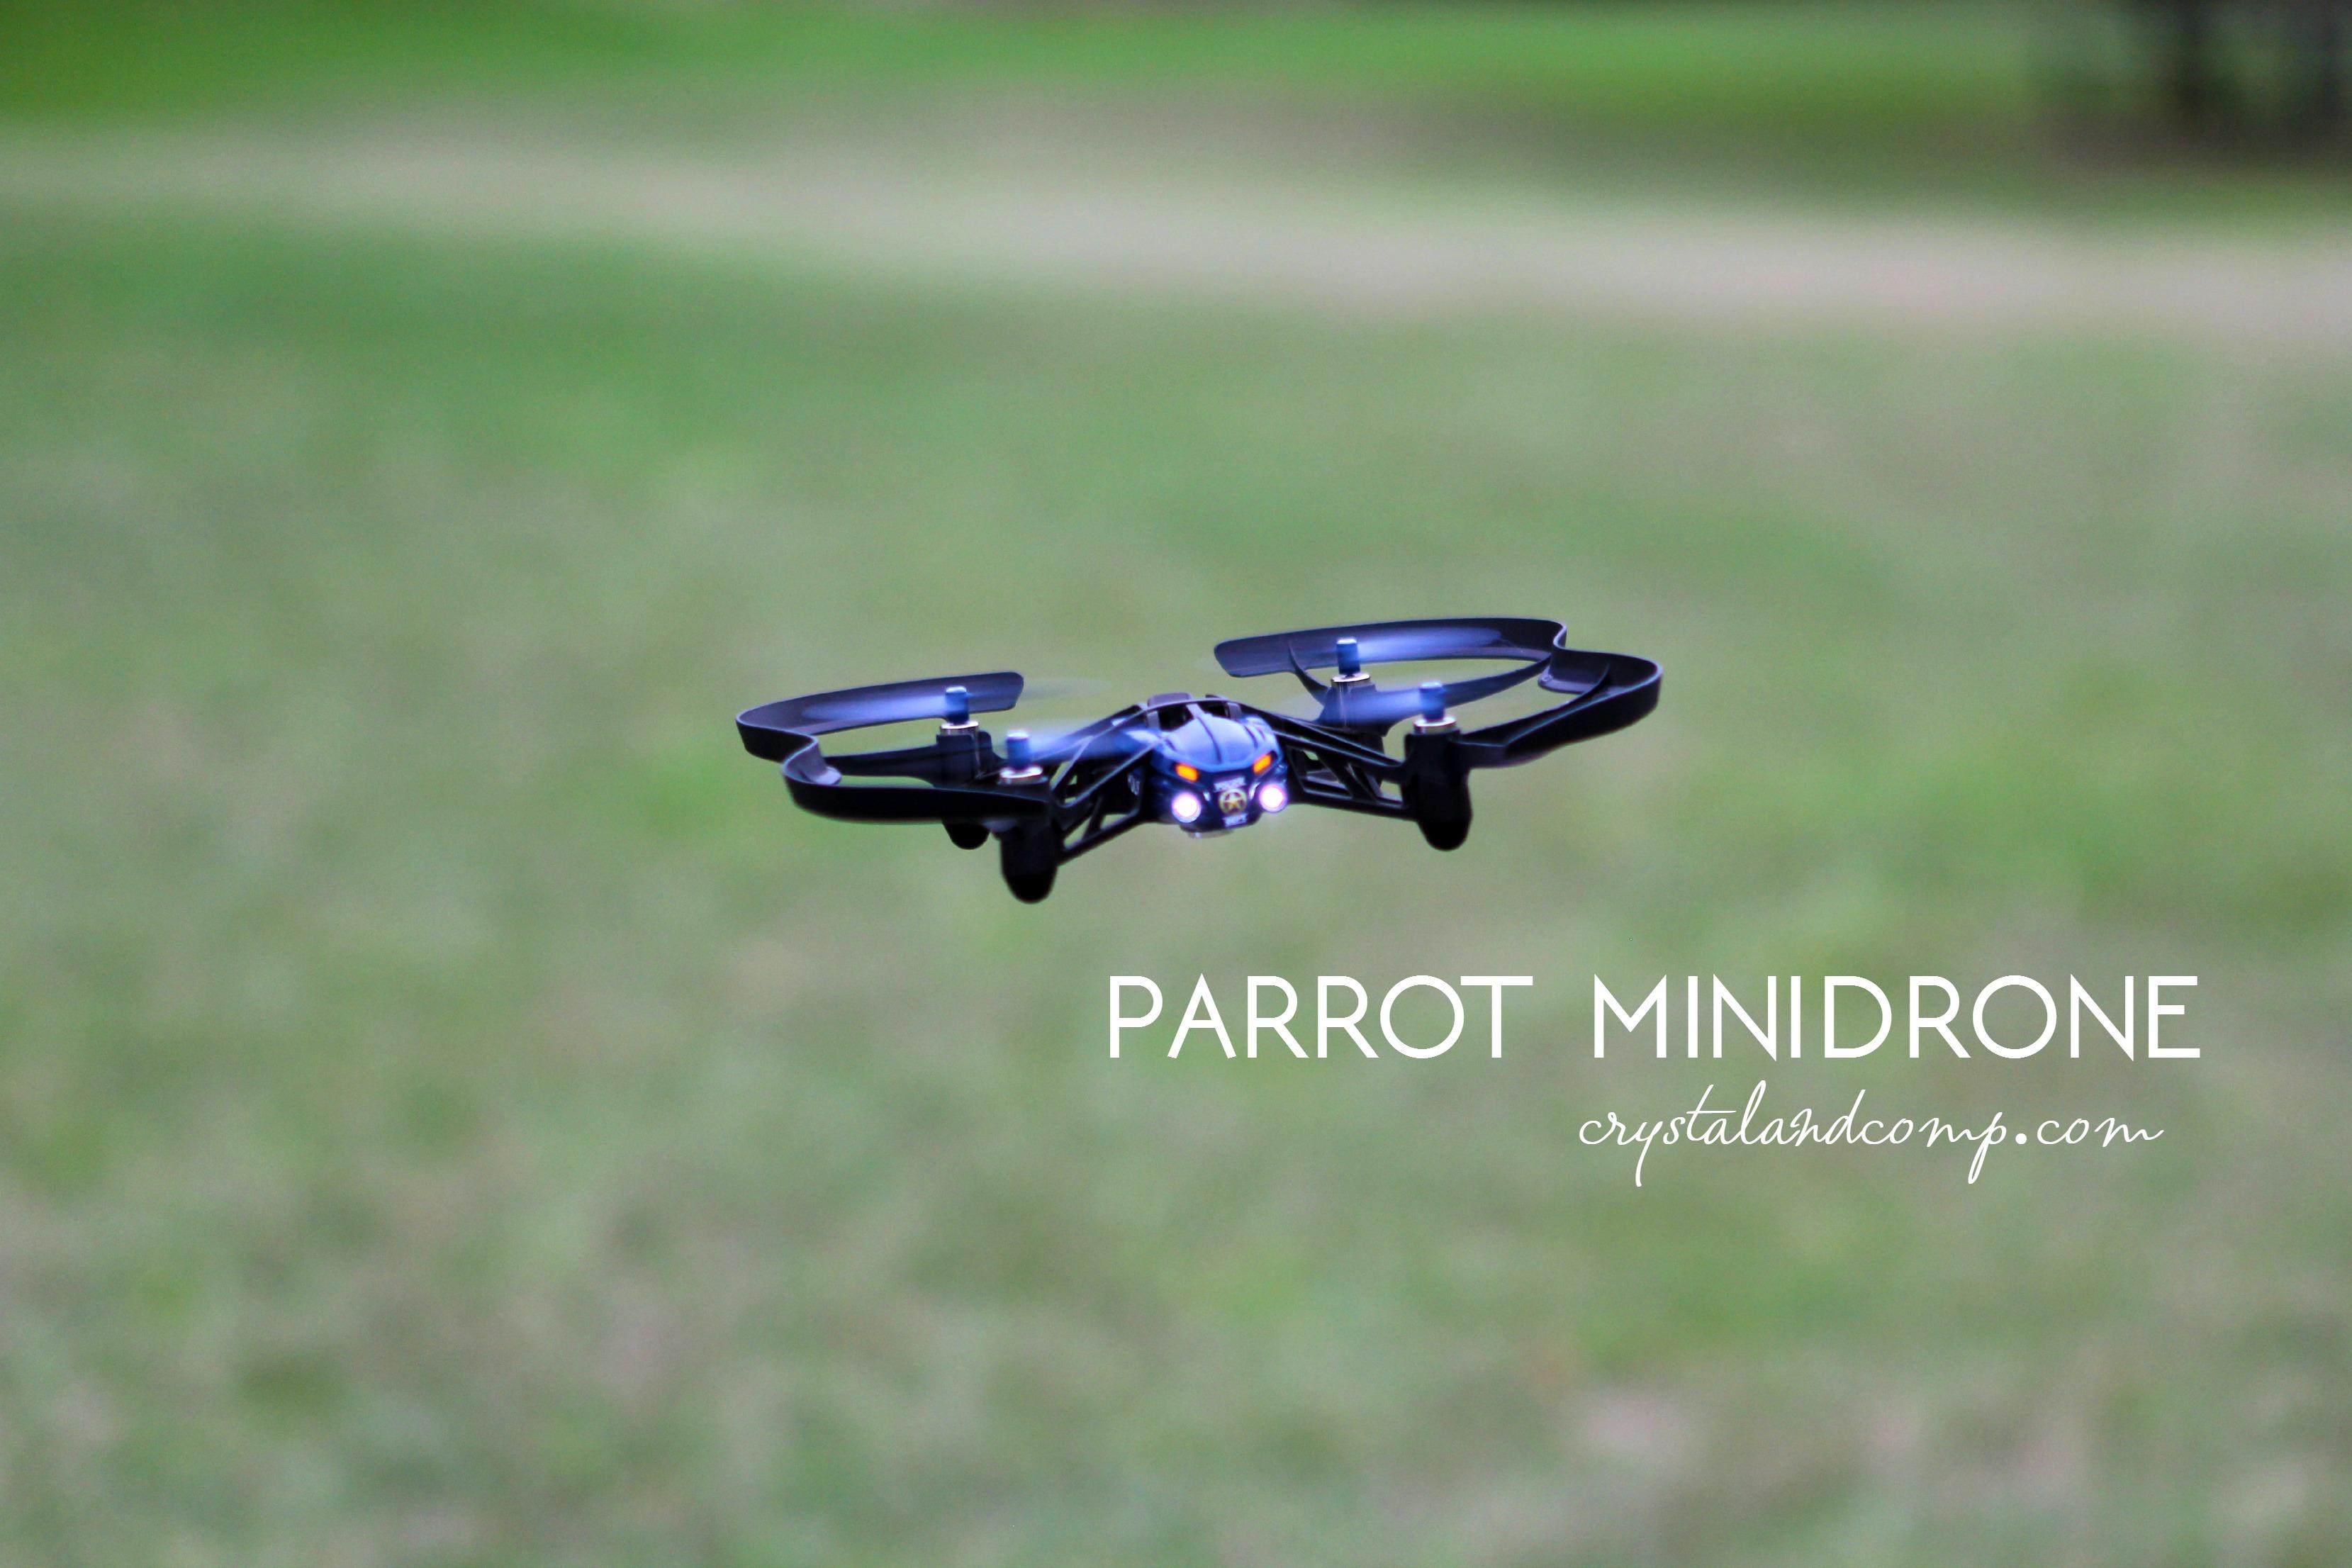 parrot minidrones. Black Bedroom Furniture Sets. Home Design Ideas